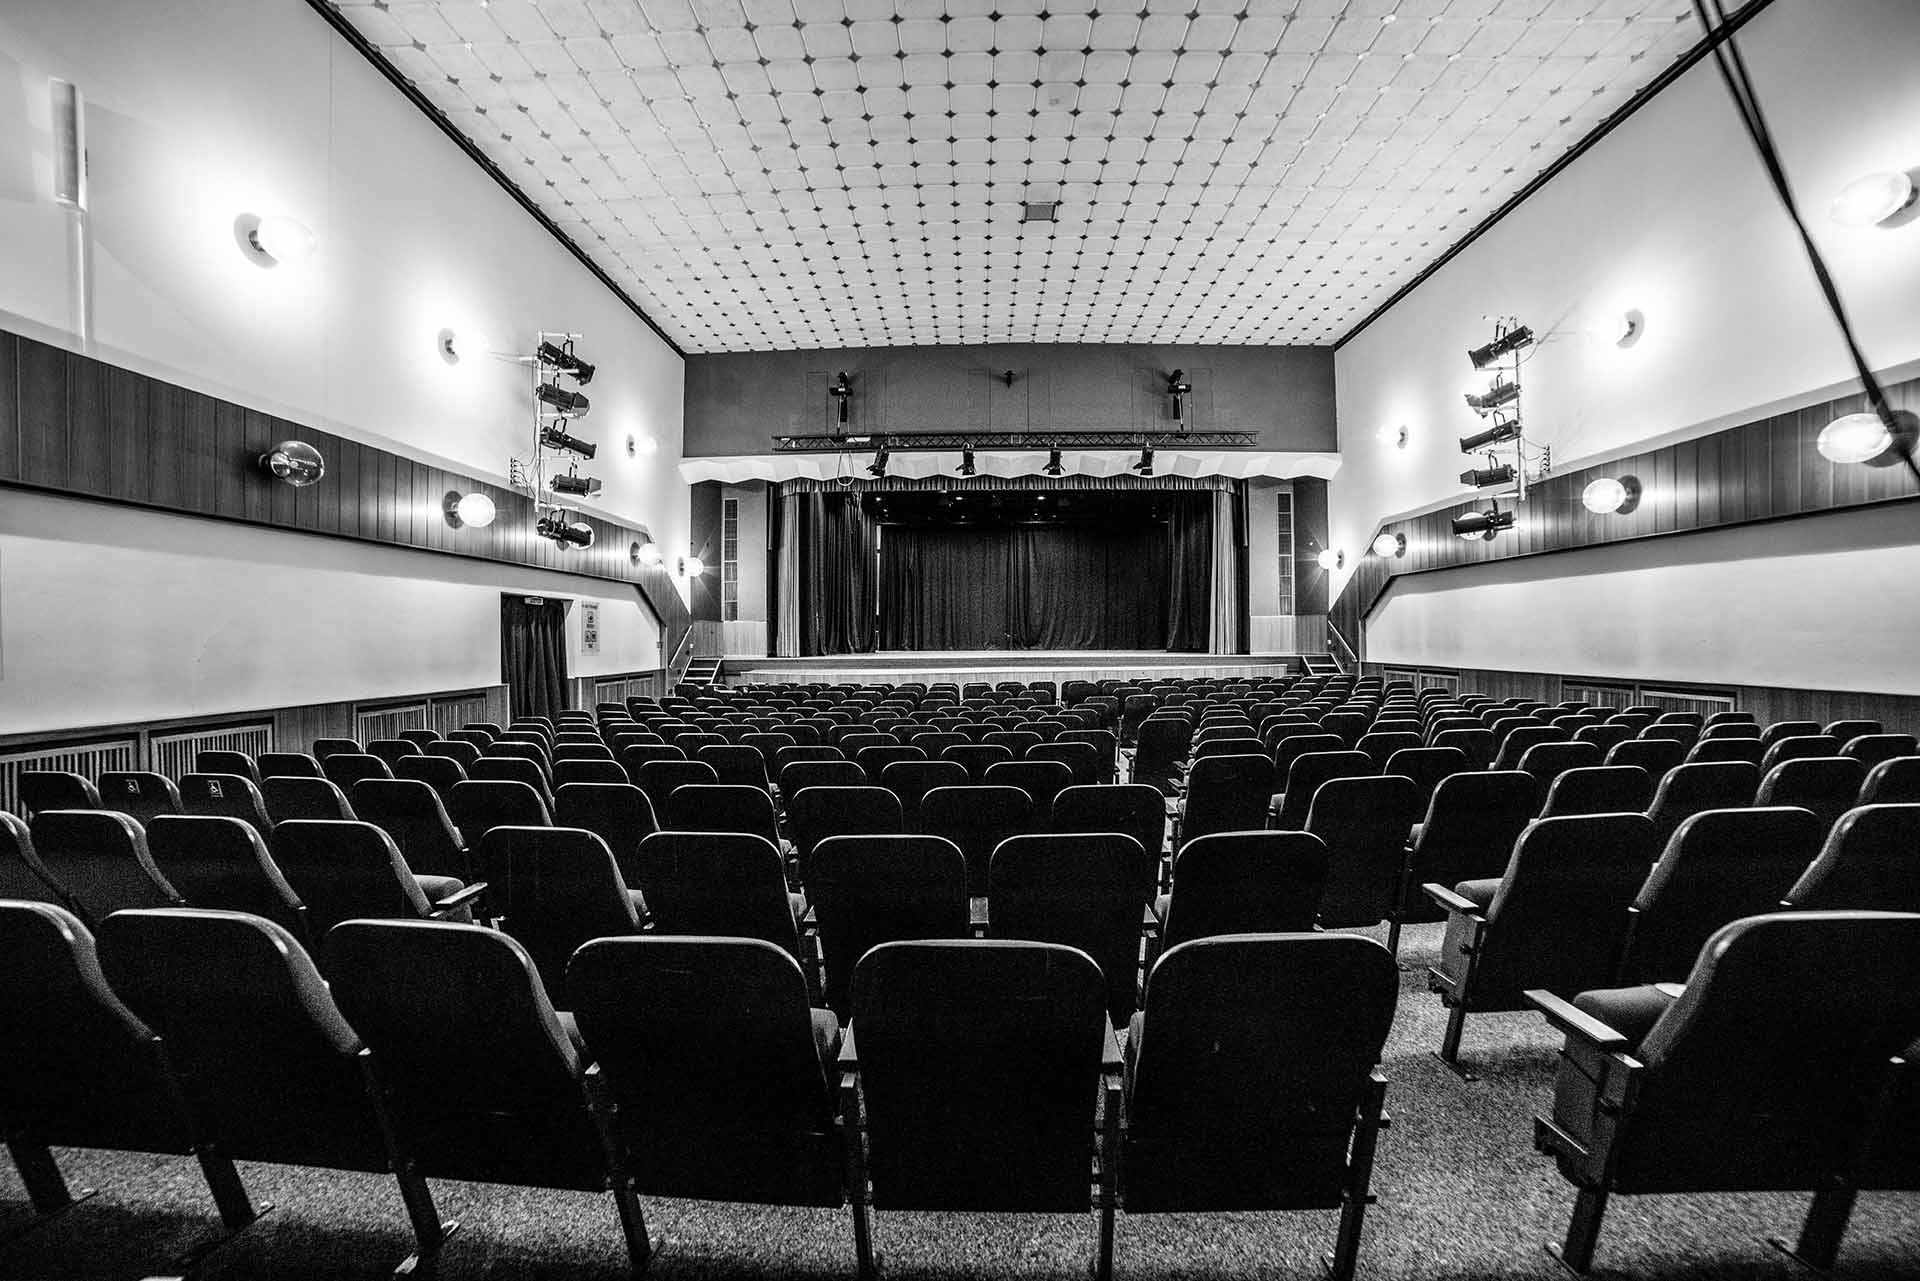 Leere Stuhlreihen im Stadttheater Wunstorf